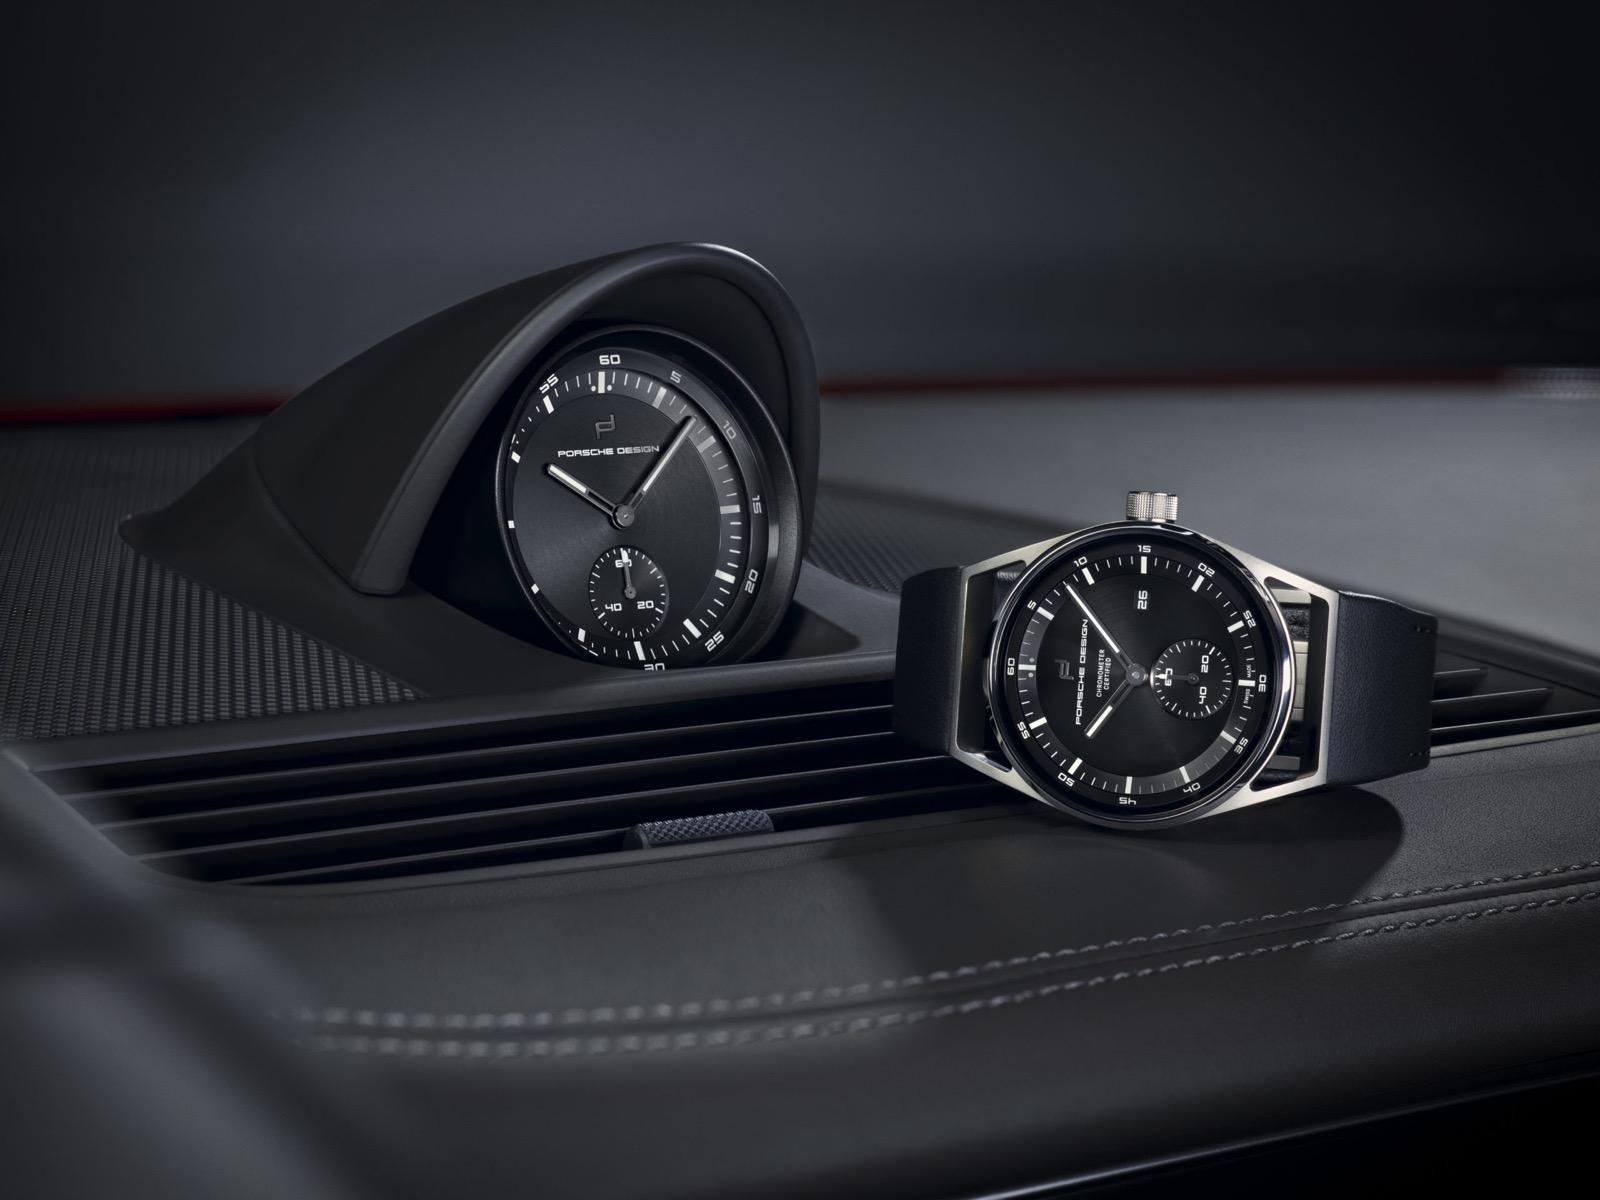 Porsche Design Sport Chrono_Subsecond